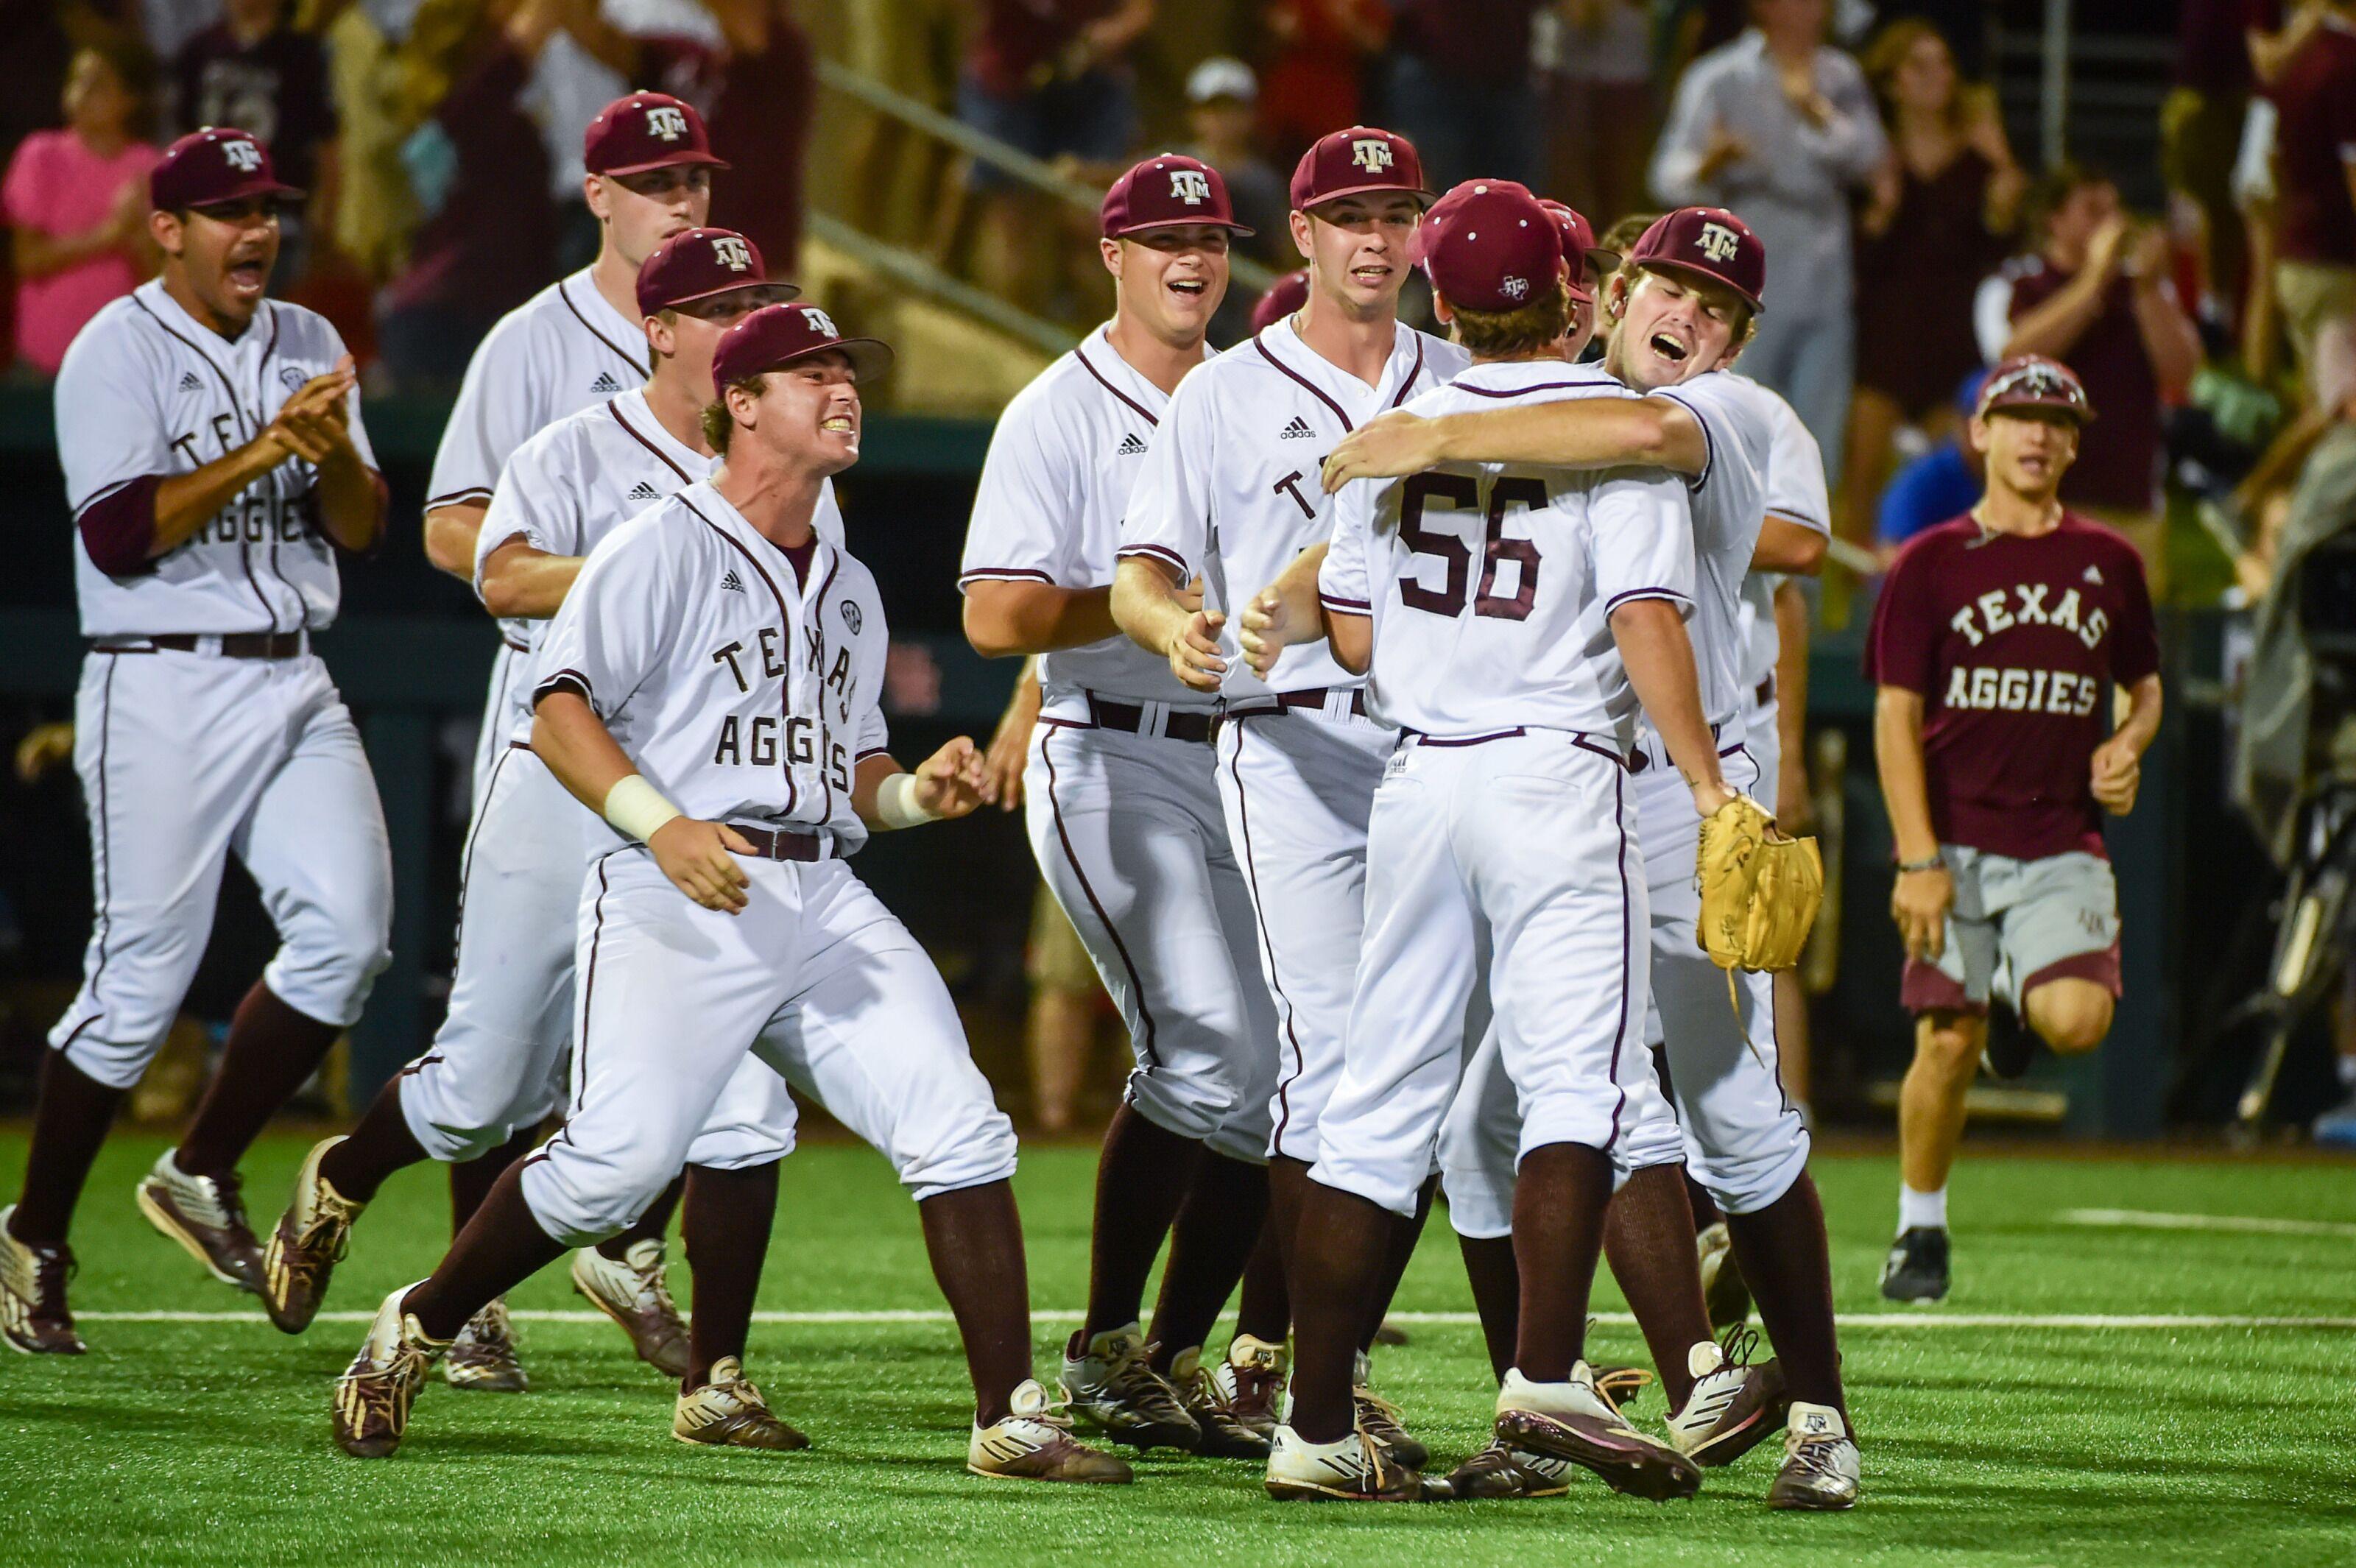 Texas A&M Baseball: South Carolina preview, game times, TV ...